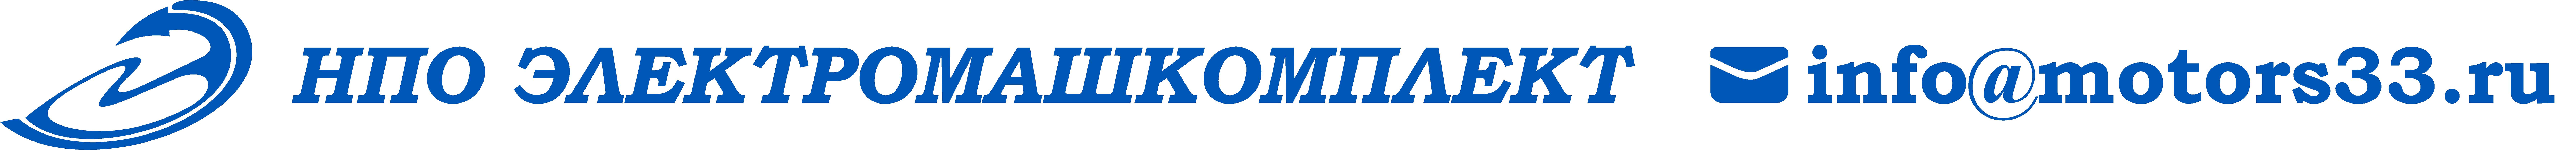 www.motors33.ru